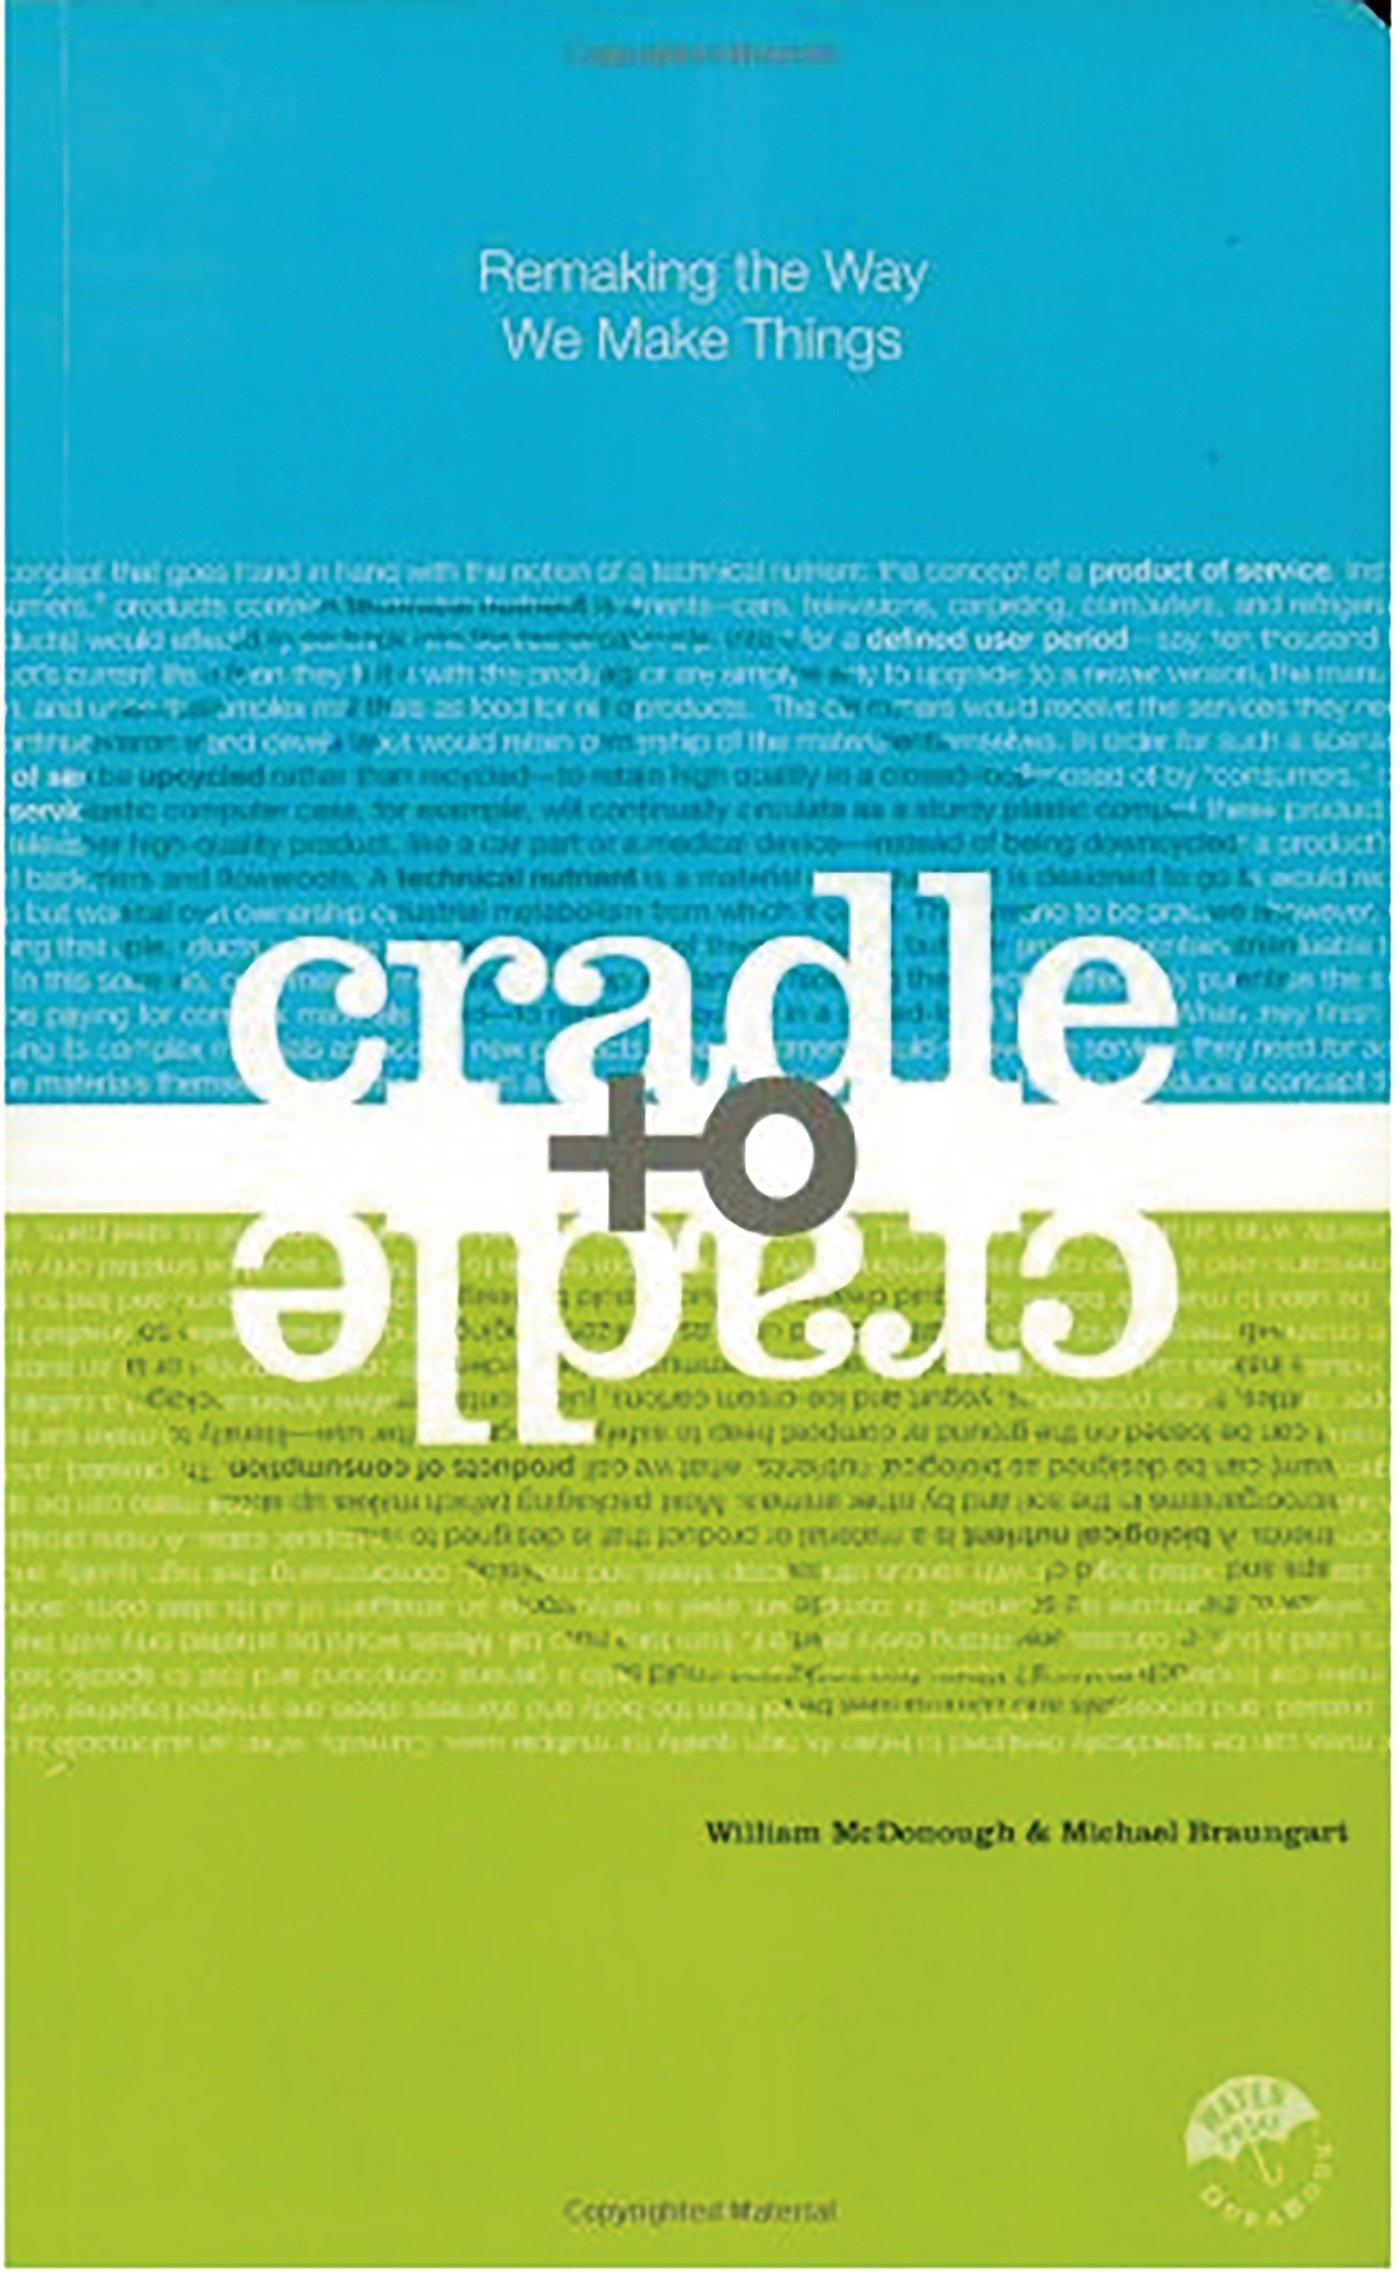 cradle to cradle book summary